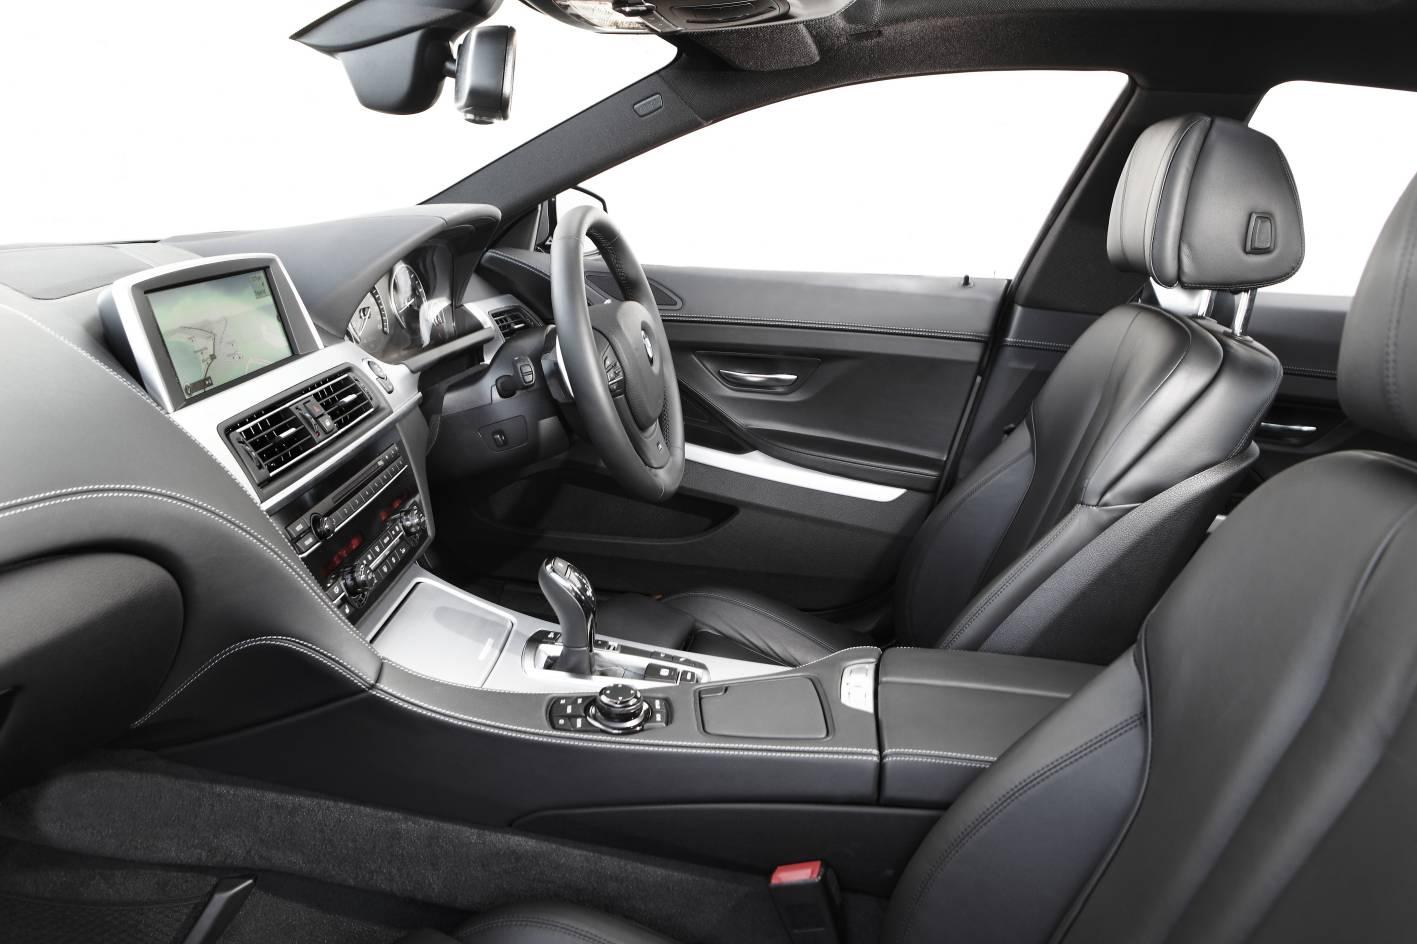 2012 BMW 6 Series Gran Coupe interior |